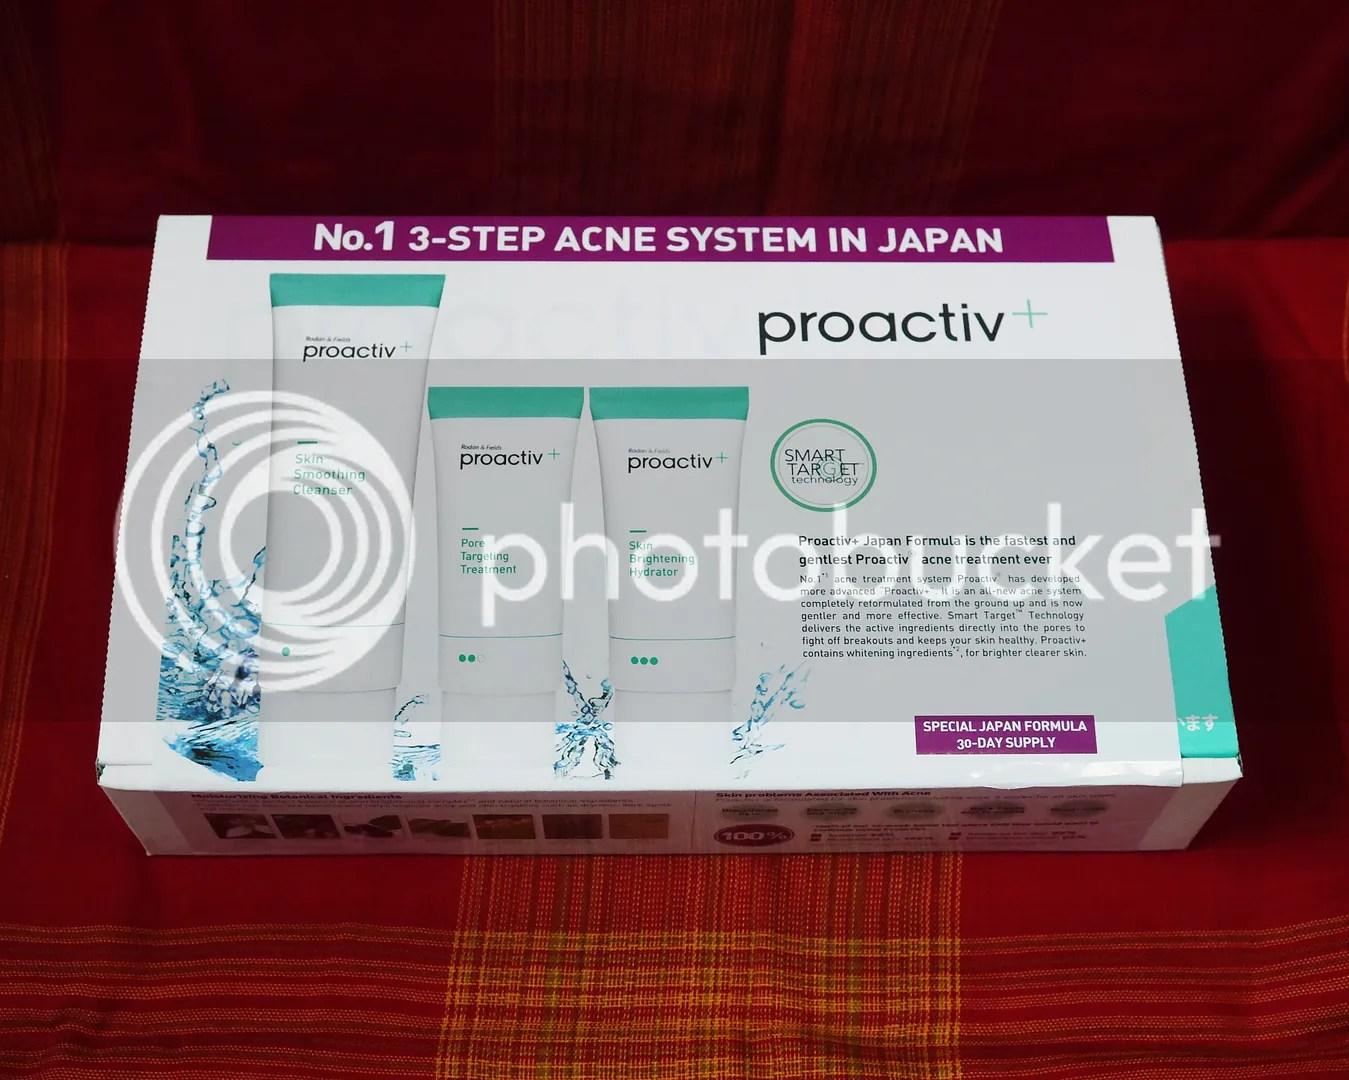 Proactiv Japan Skincare - Blackbox SG [Viktoria Jean] 2